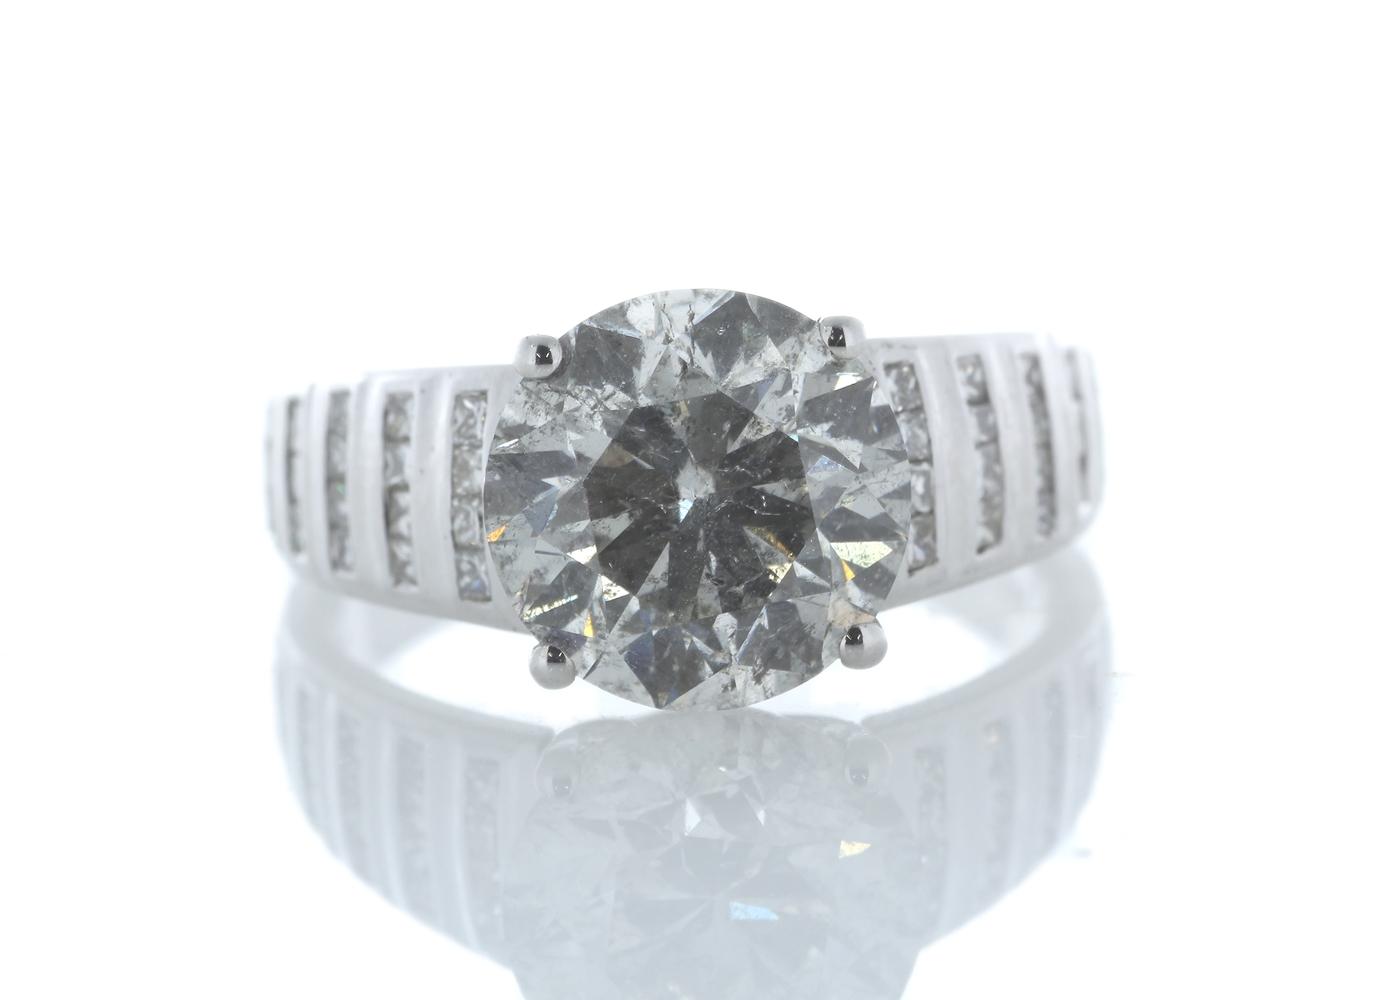 18ct White Gold Single Stone Prong Set With Stone Set Shoulders Diamond Ring 4.65 Carats